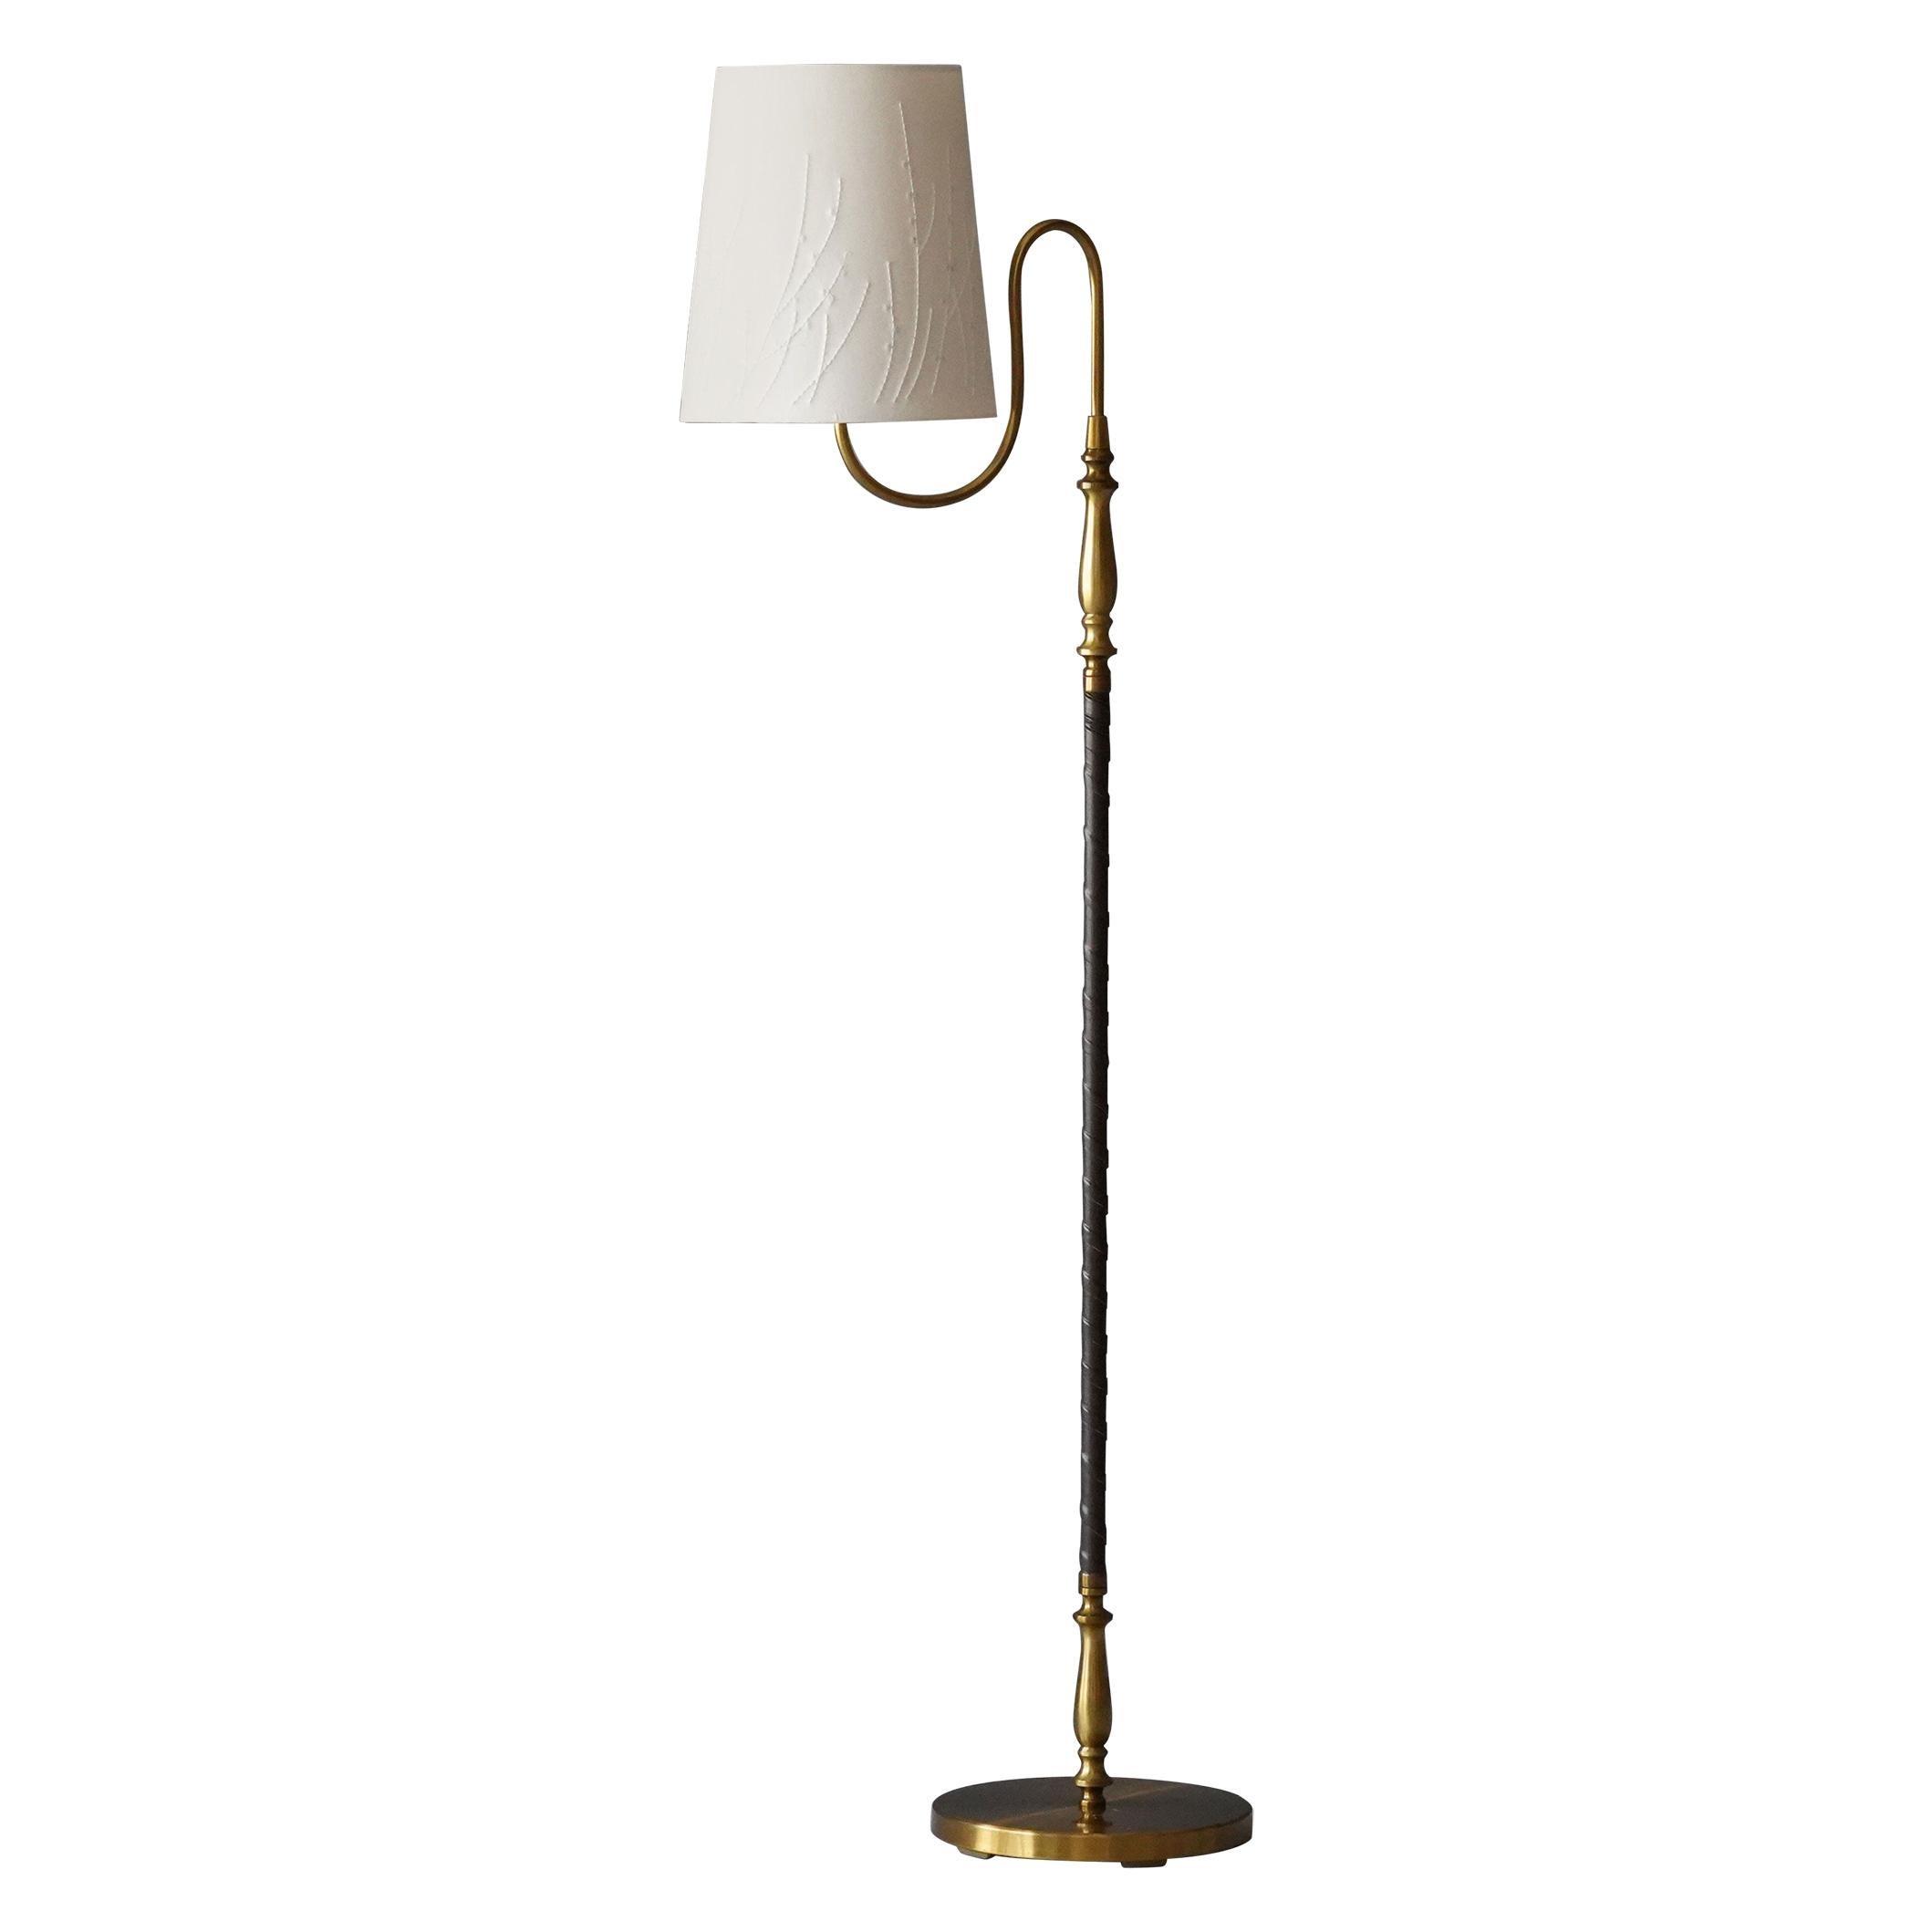 Einar Bäckström, Rare Floor Lamp, Brass, Leather, Fabric, Sweden, 1950s